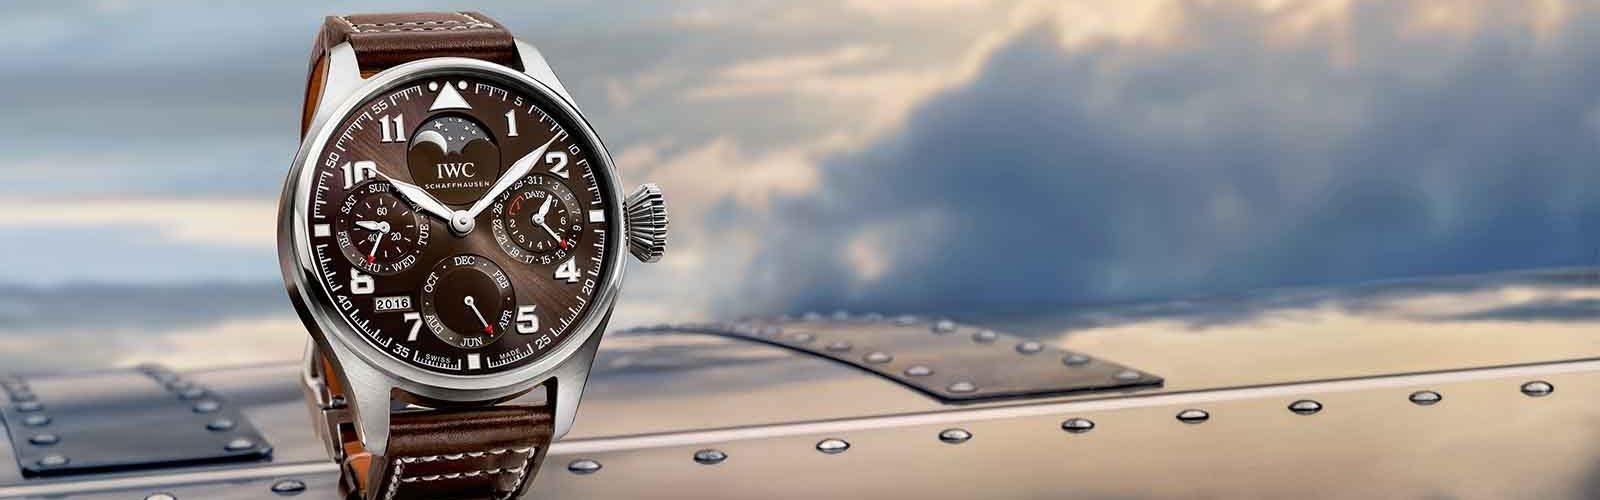 IWC_Big Pilots Watch Perpetual Calendar Antoine de saint exupéry